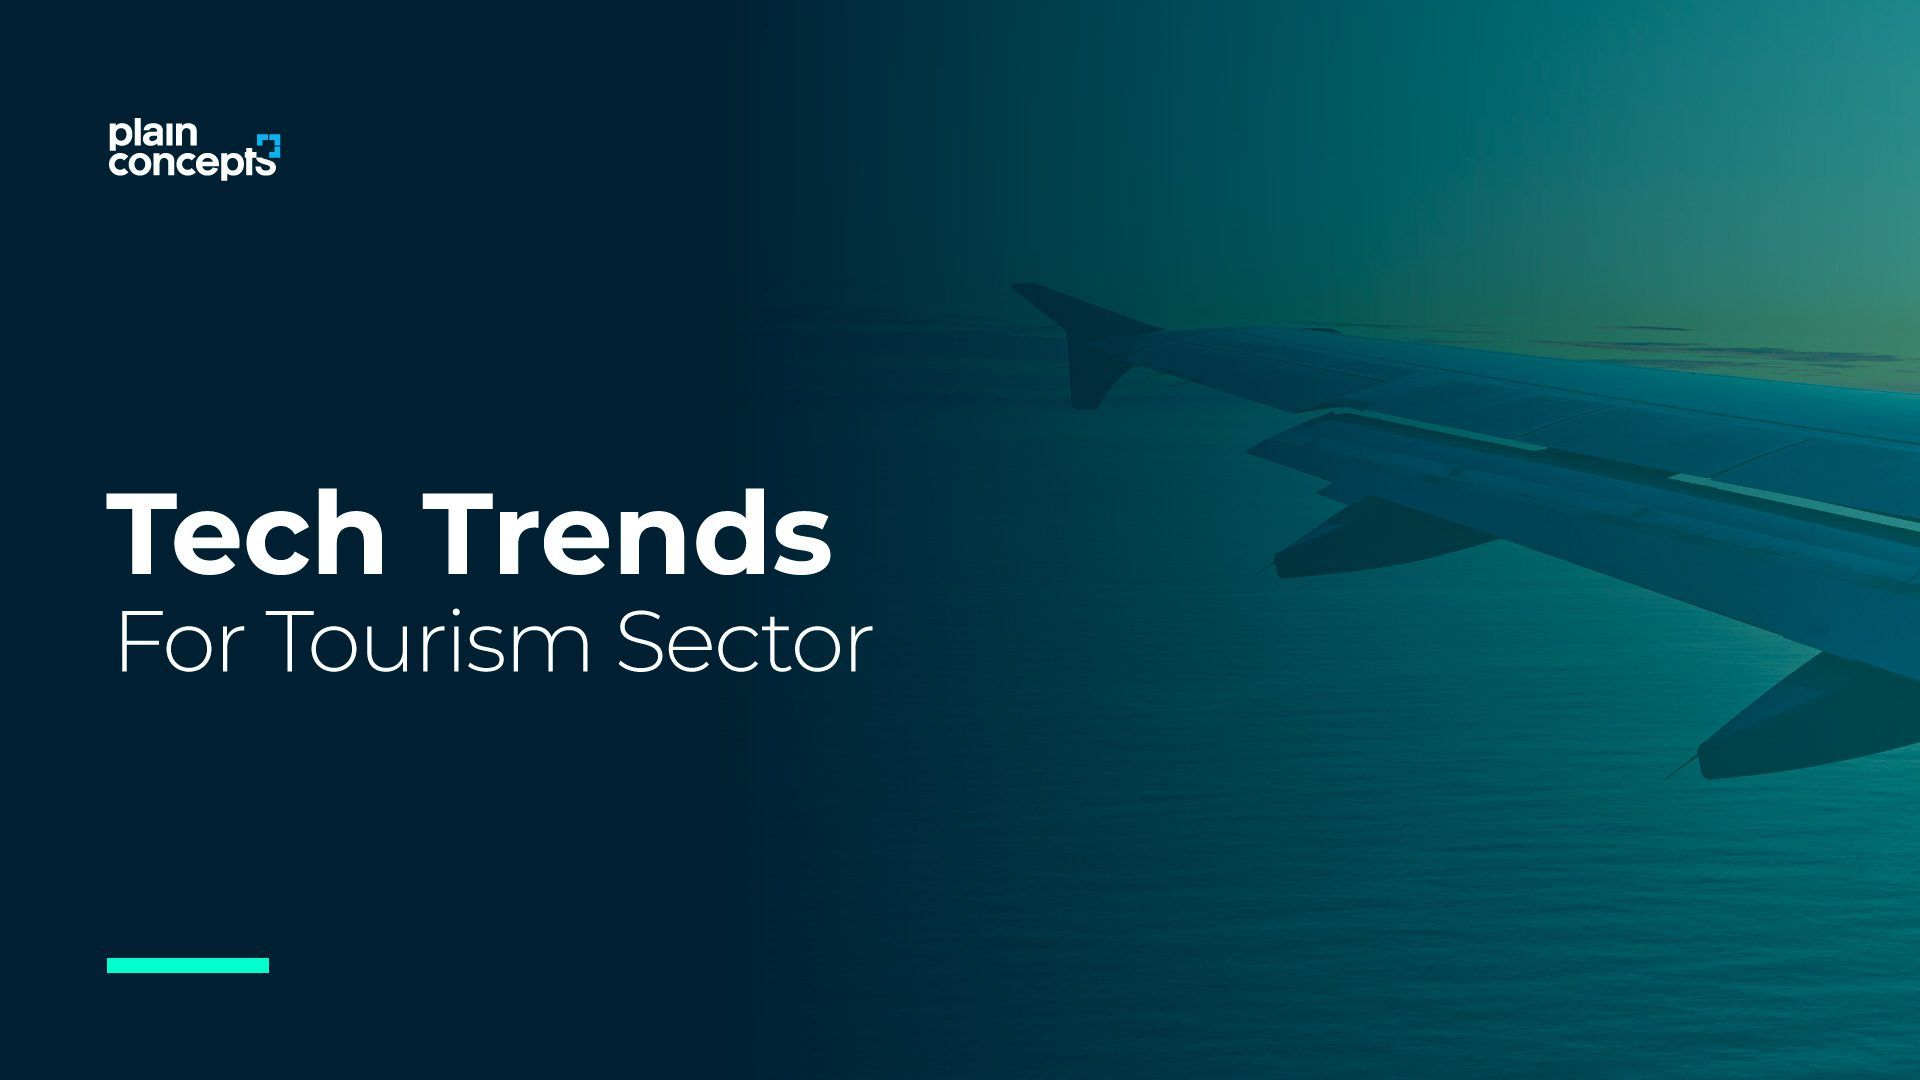 tech trends tourism